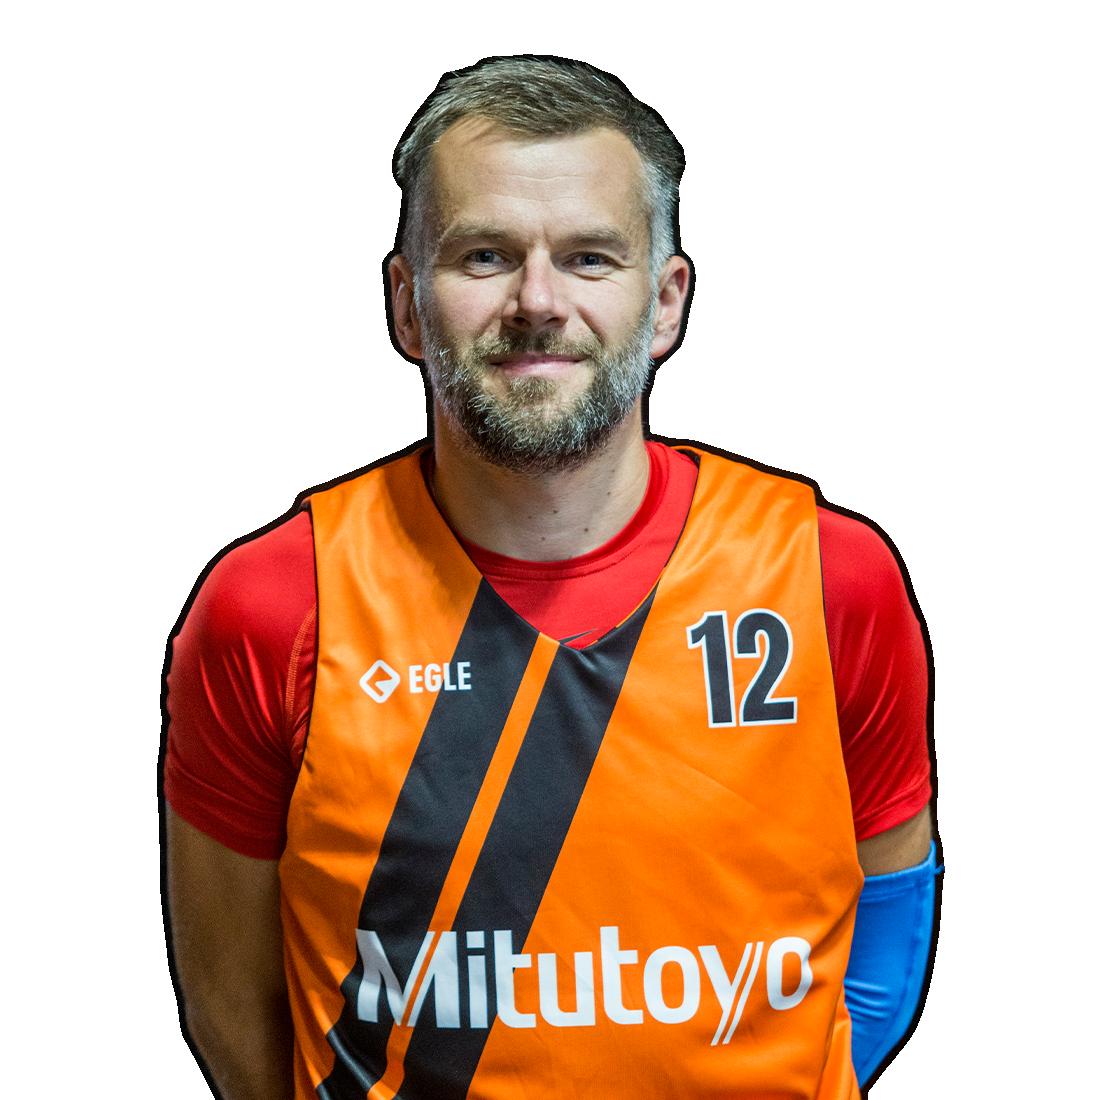 Tomasz Bubula